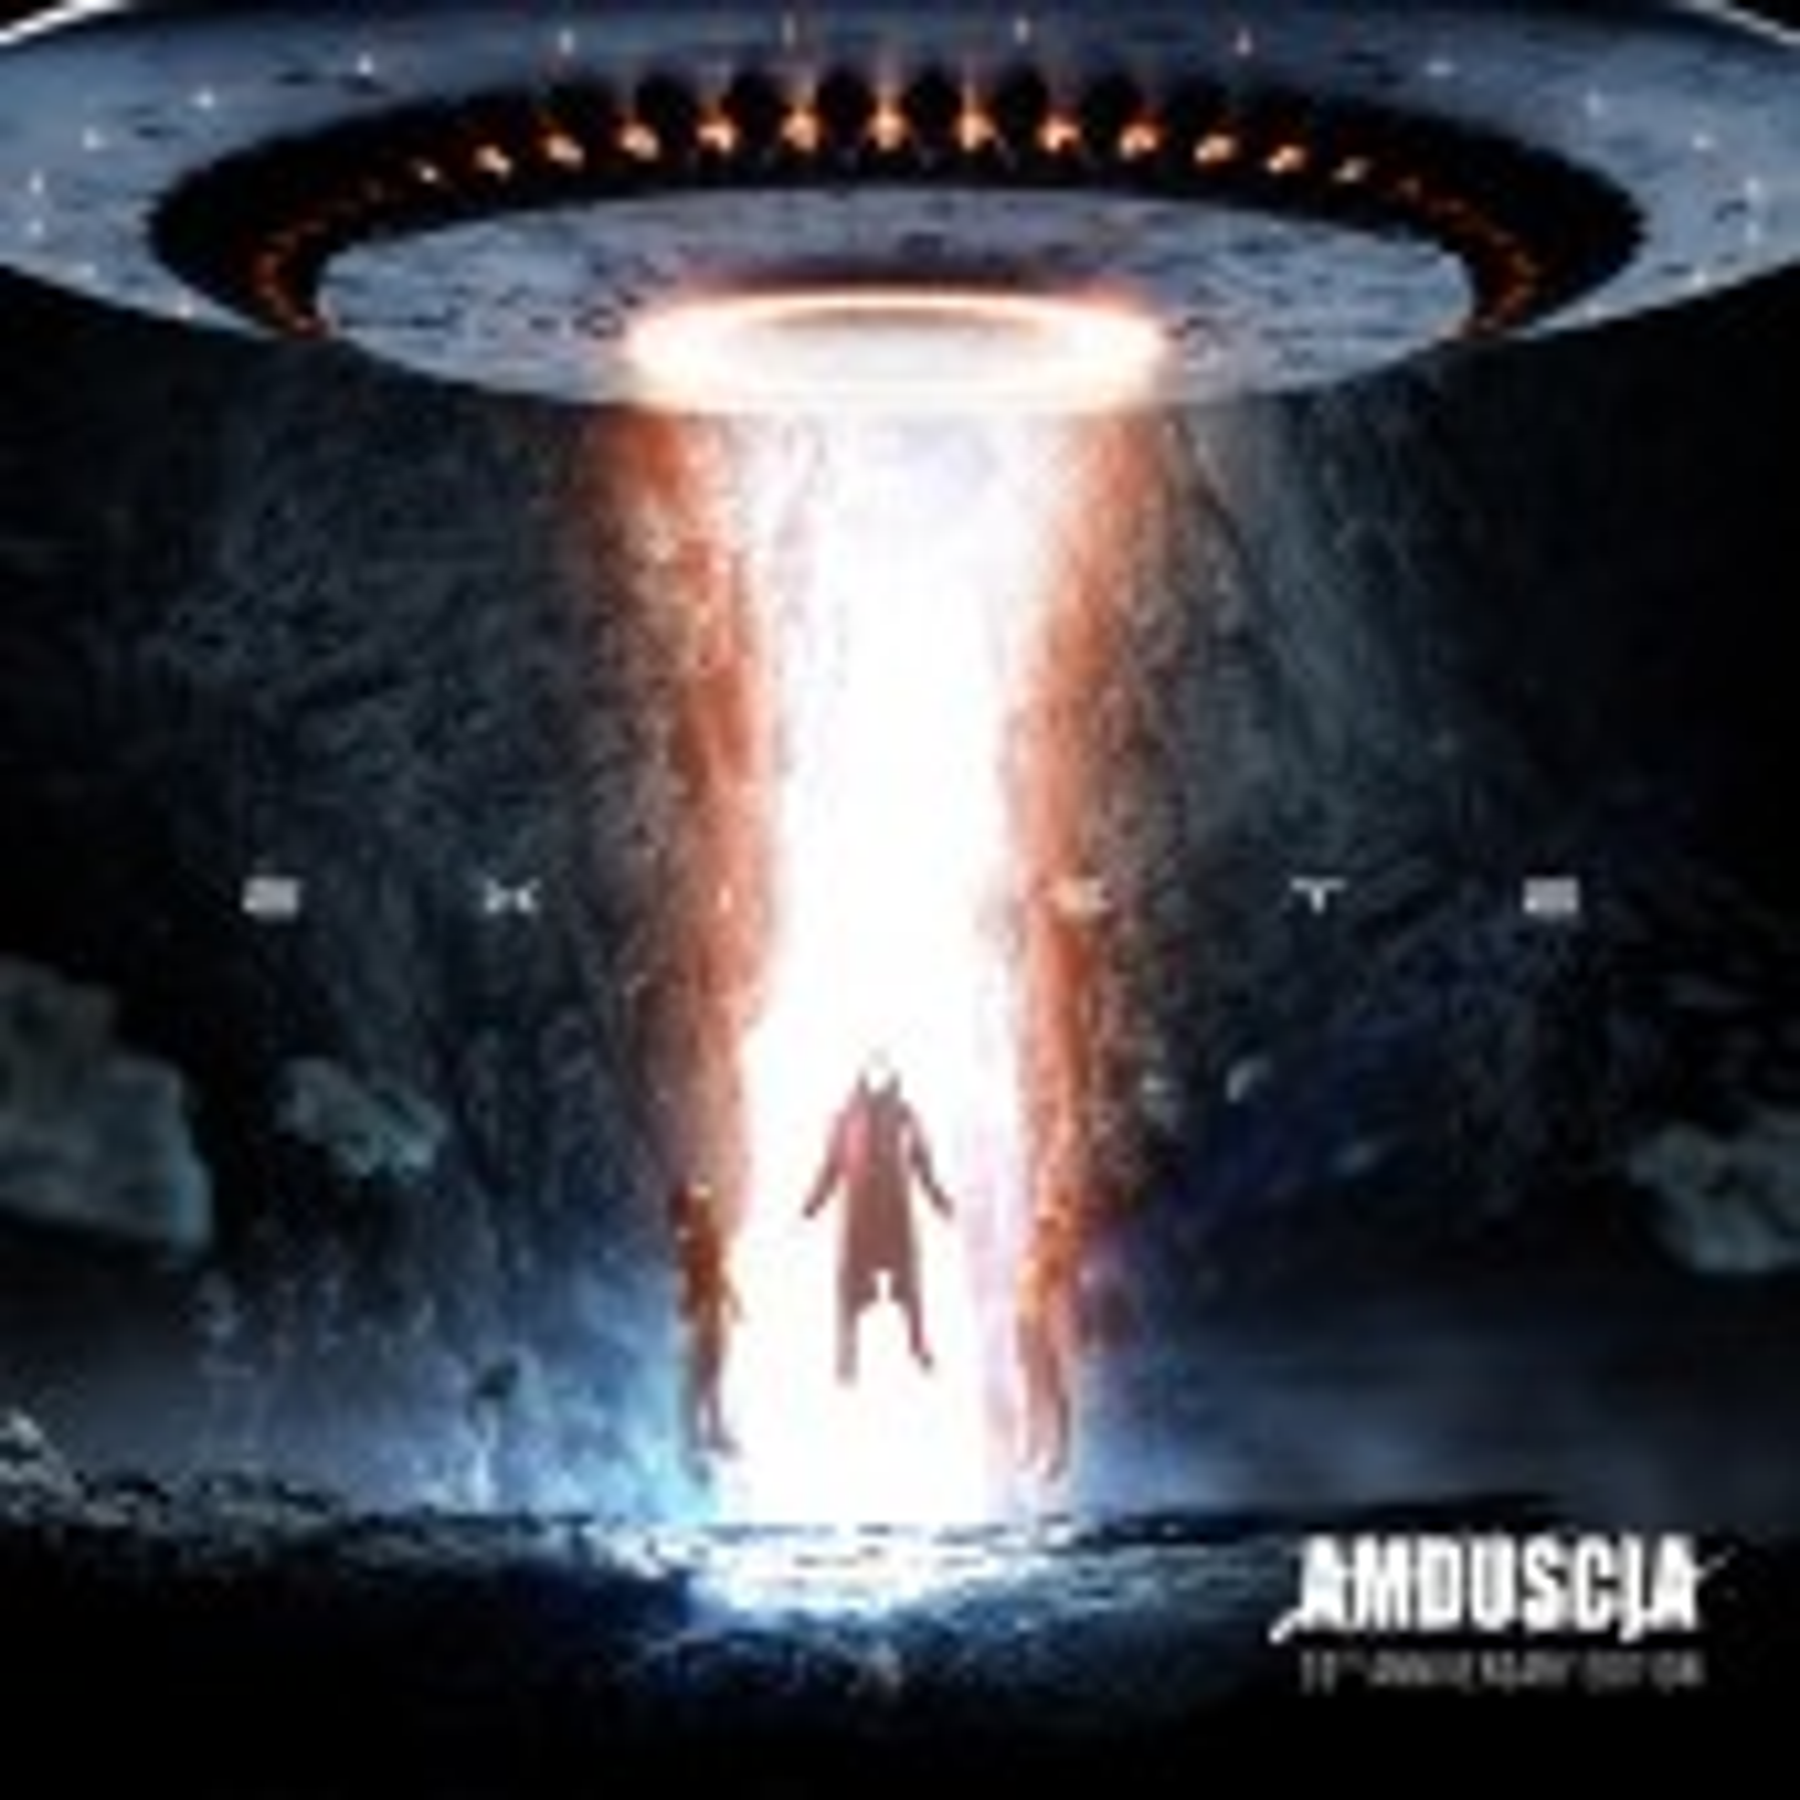 Amduscia - Existe (Limited Edition) - 3CD